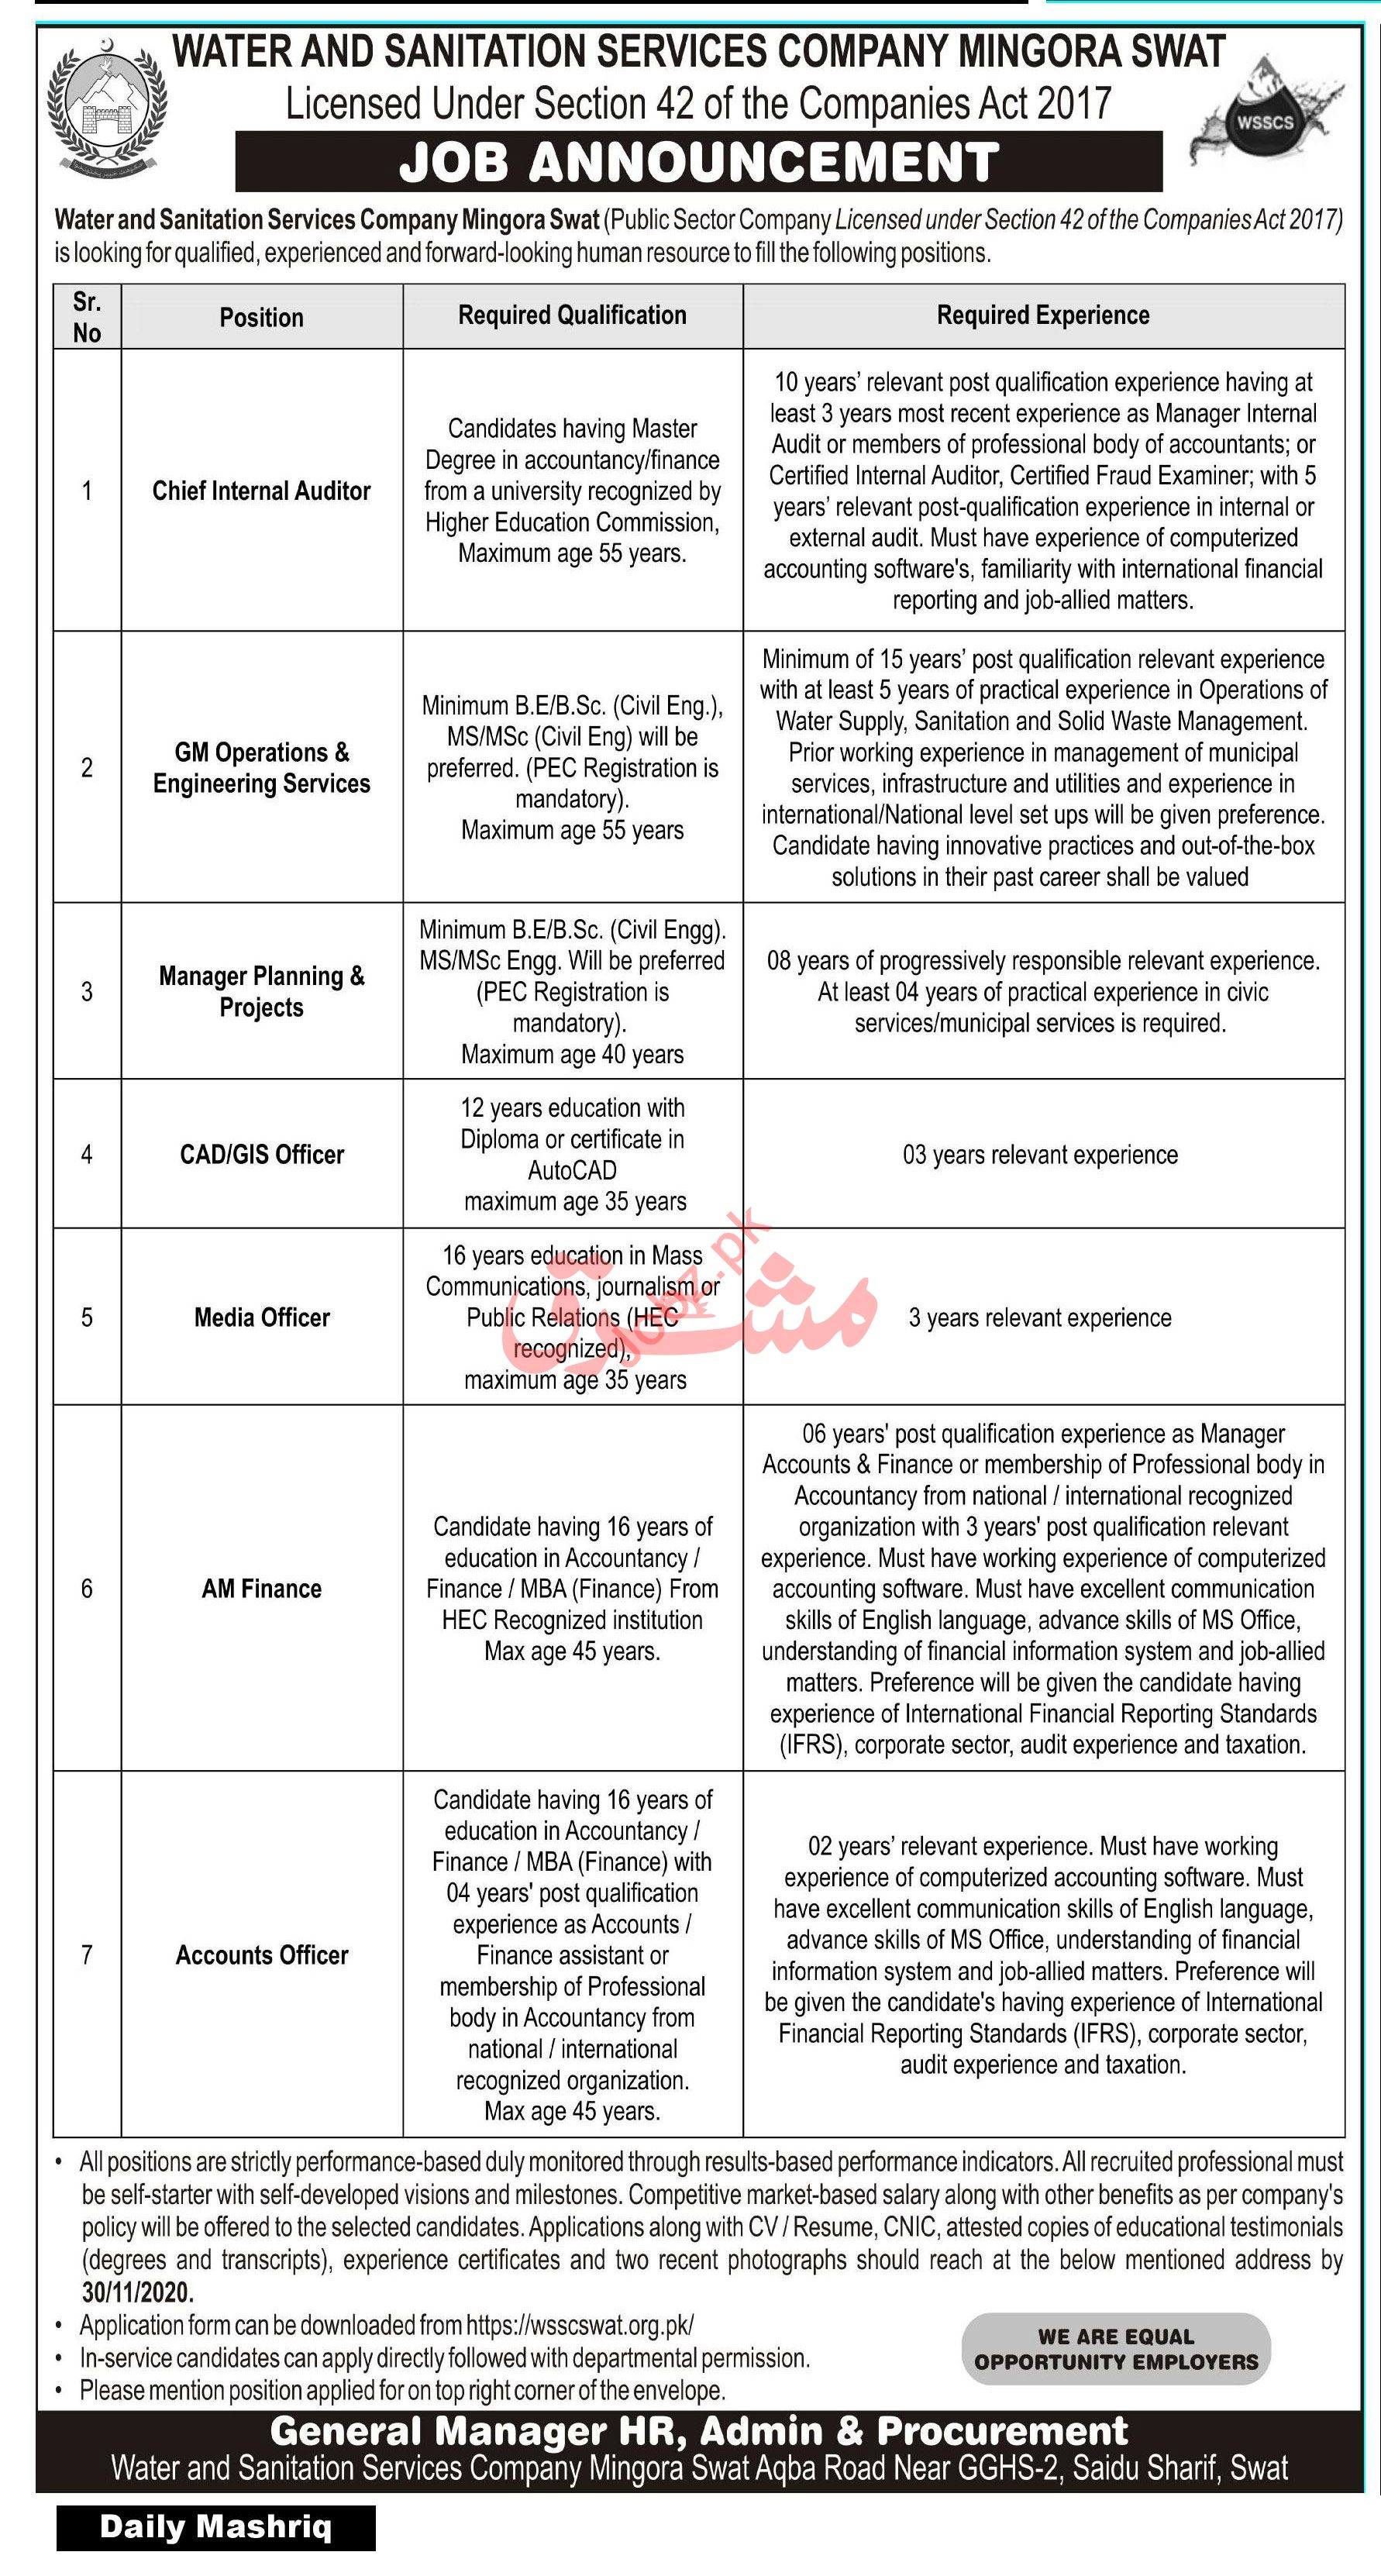 Water & Sanitation Services Company WSSC Swat Jobs 2020